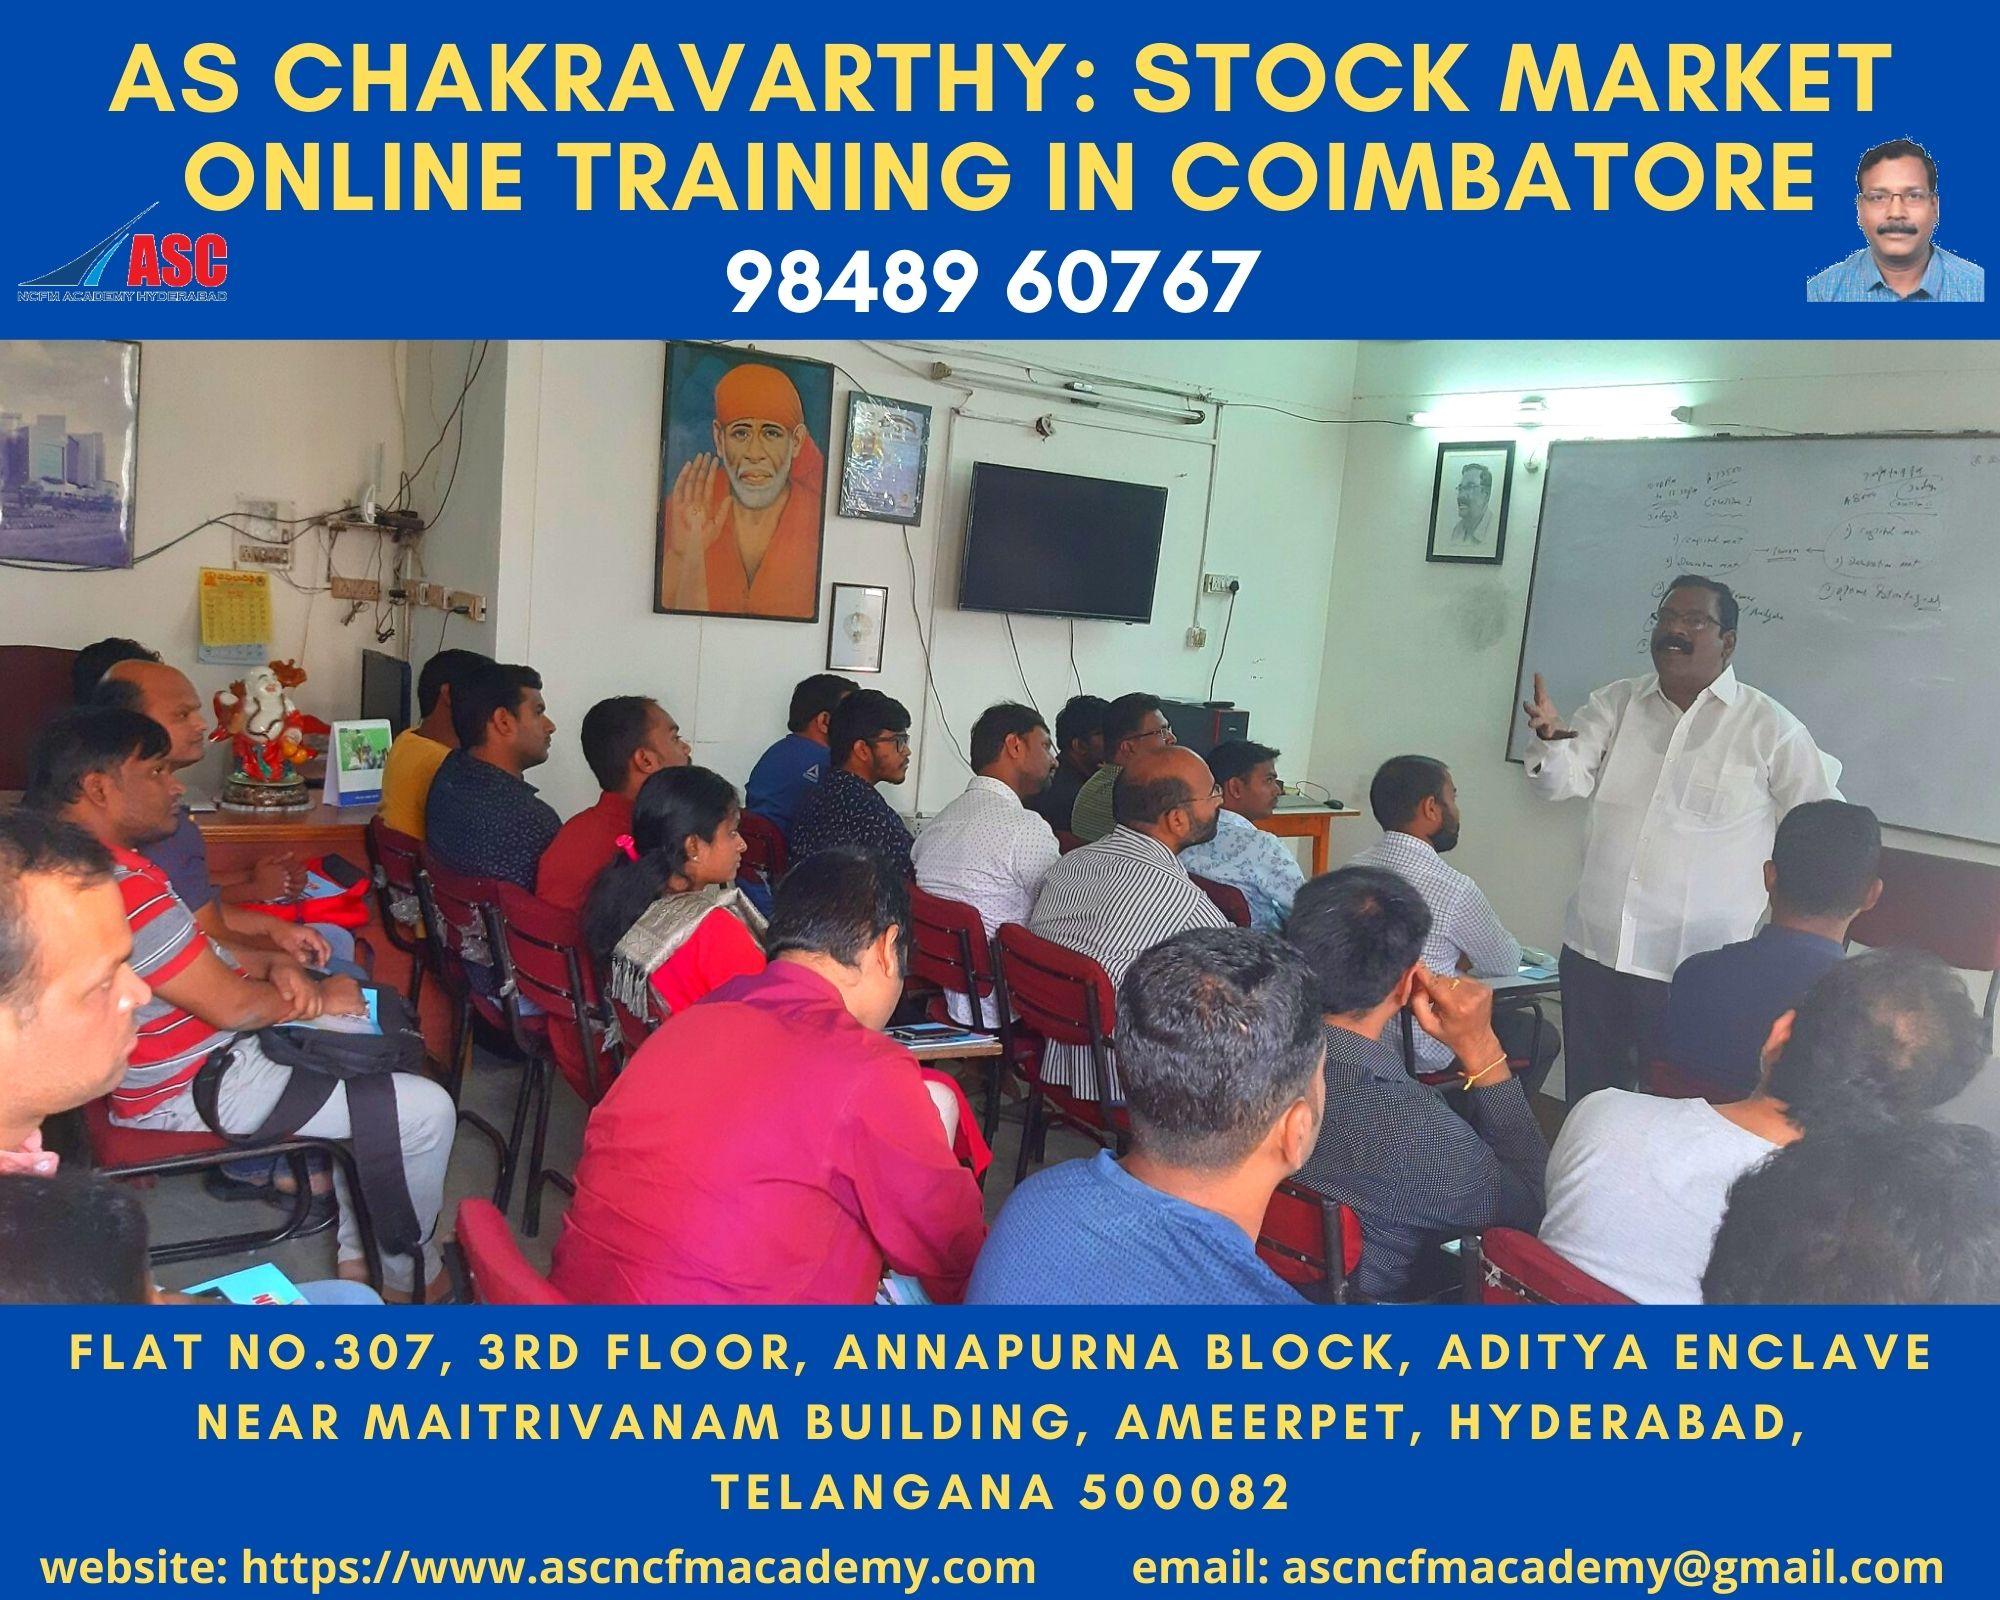 Online Stock Market Technical Training in Telugu Coimbatore